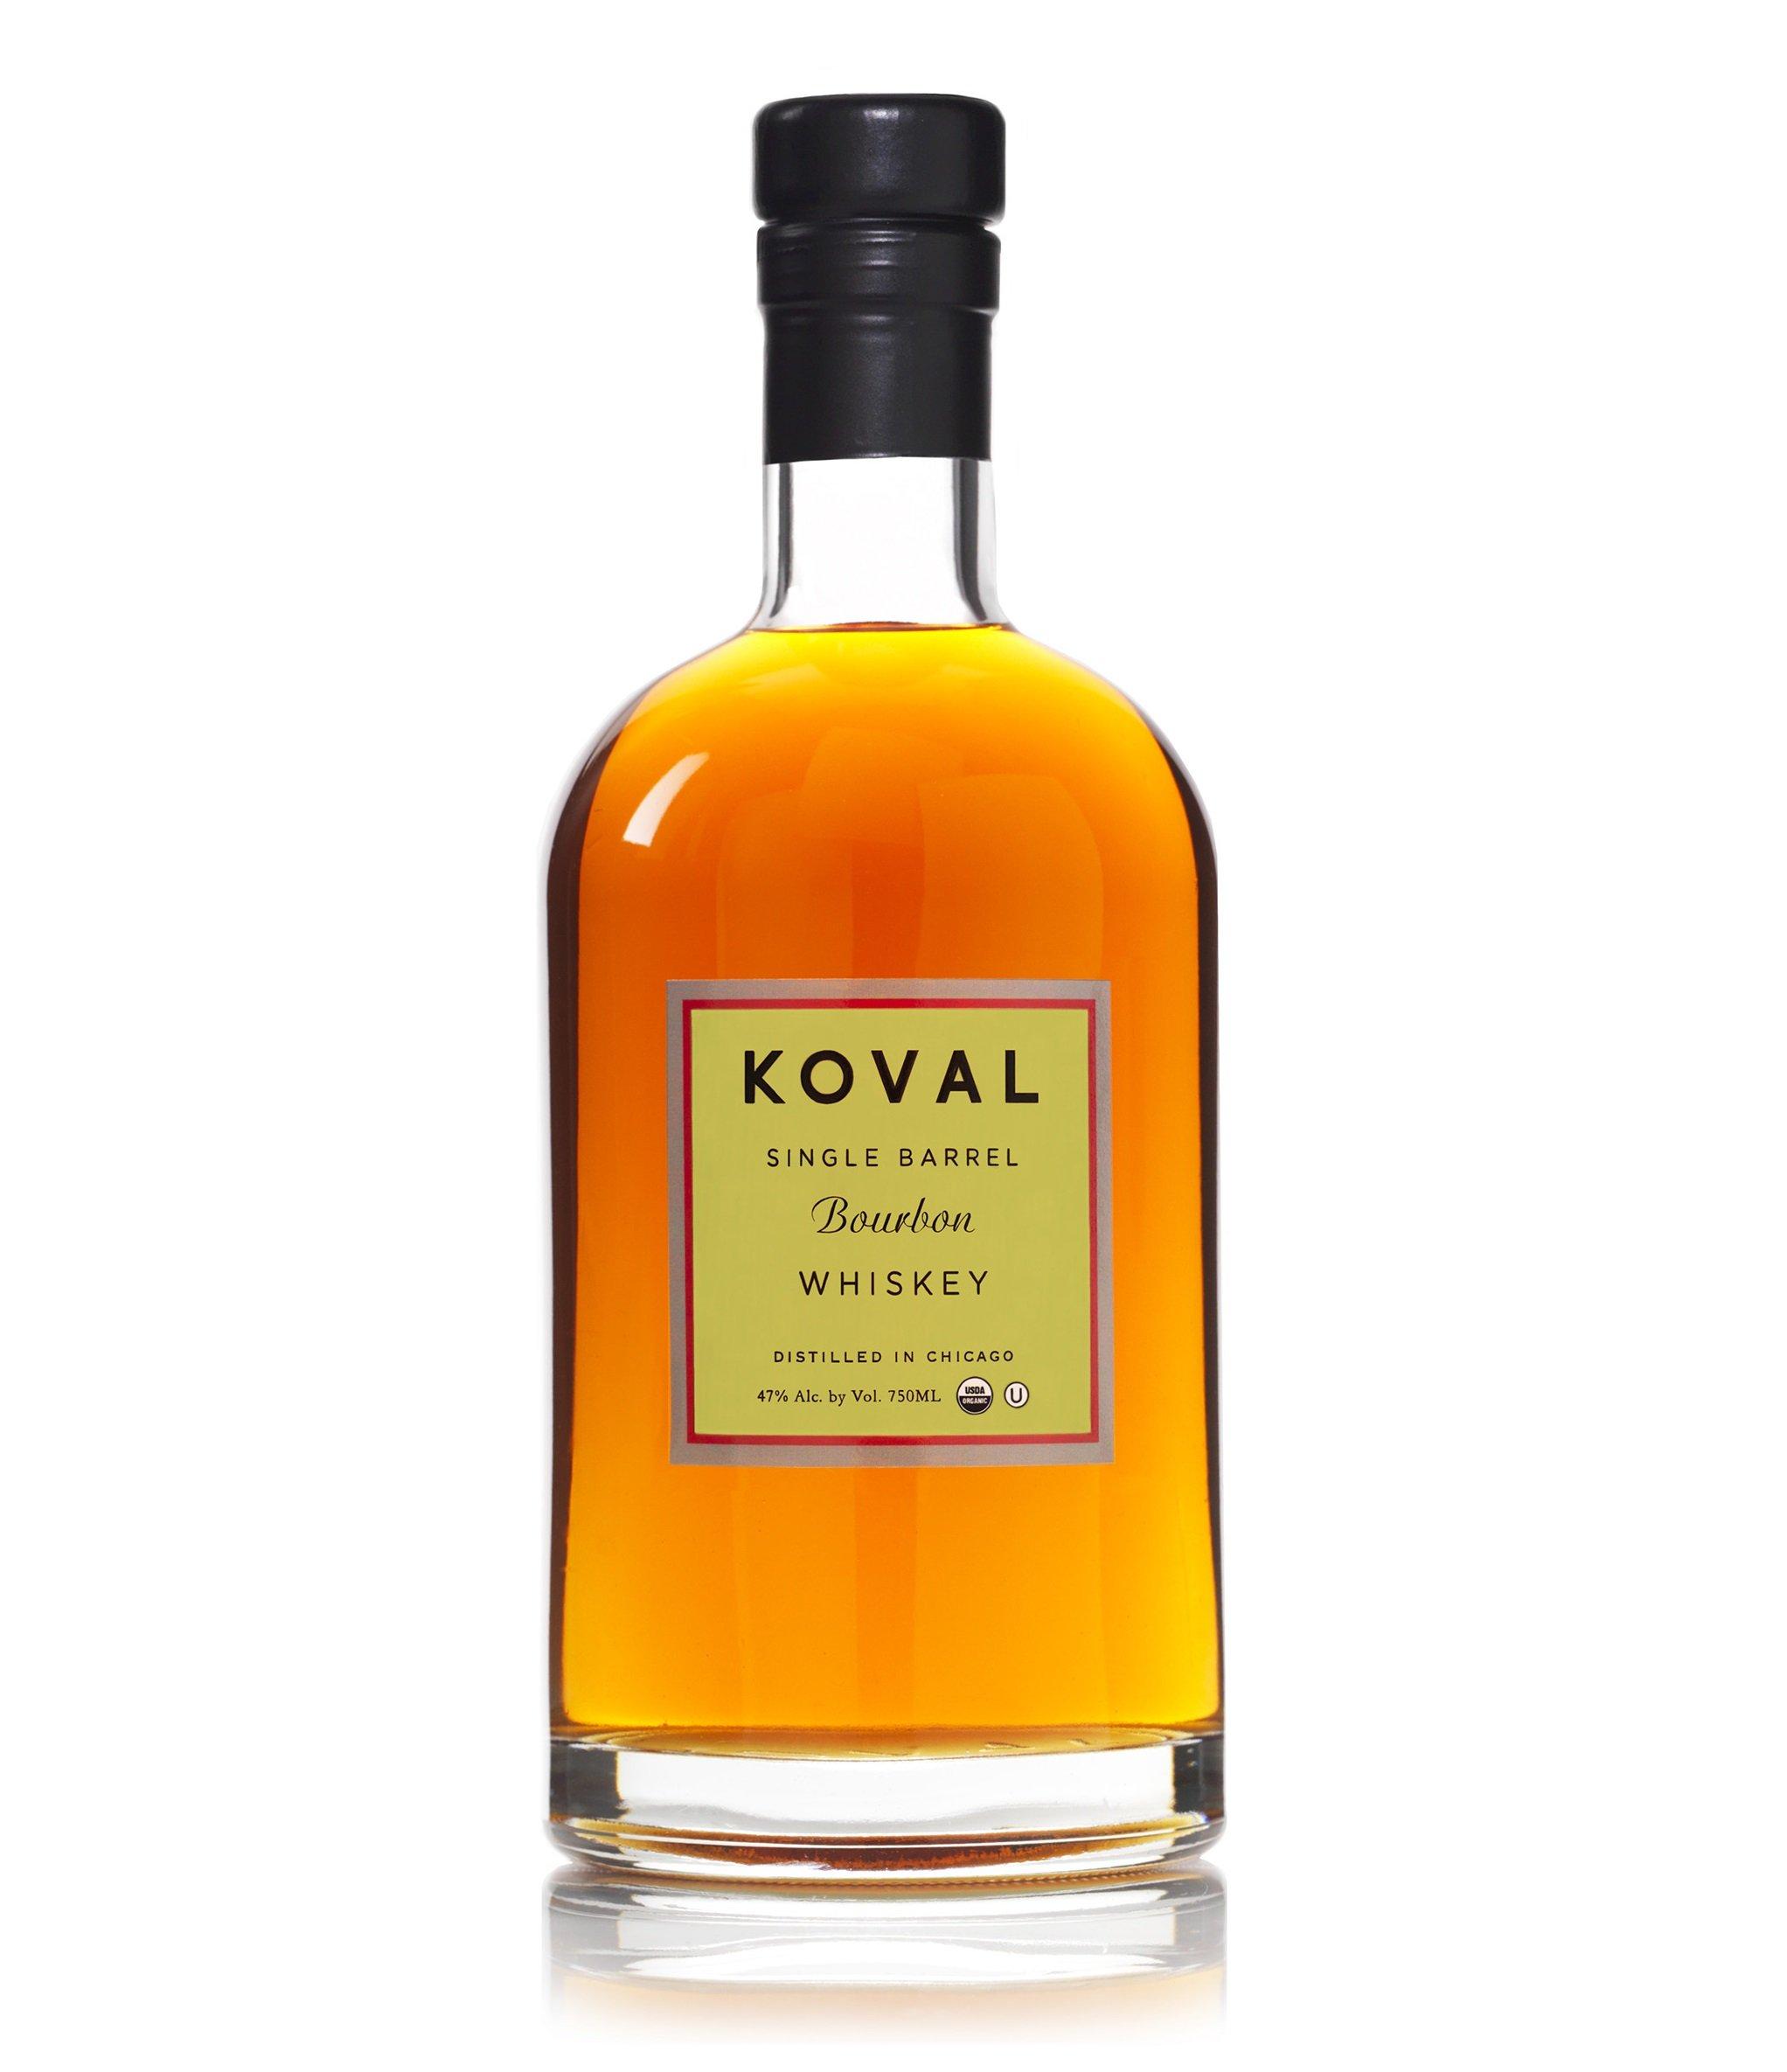 Koval Single Barrel Bourbon